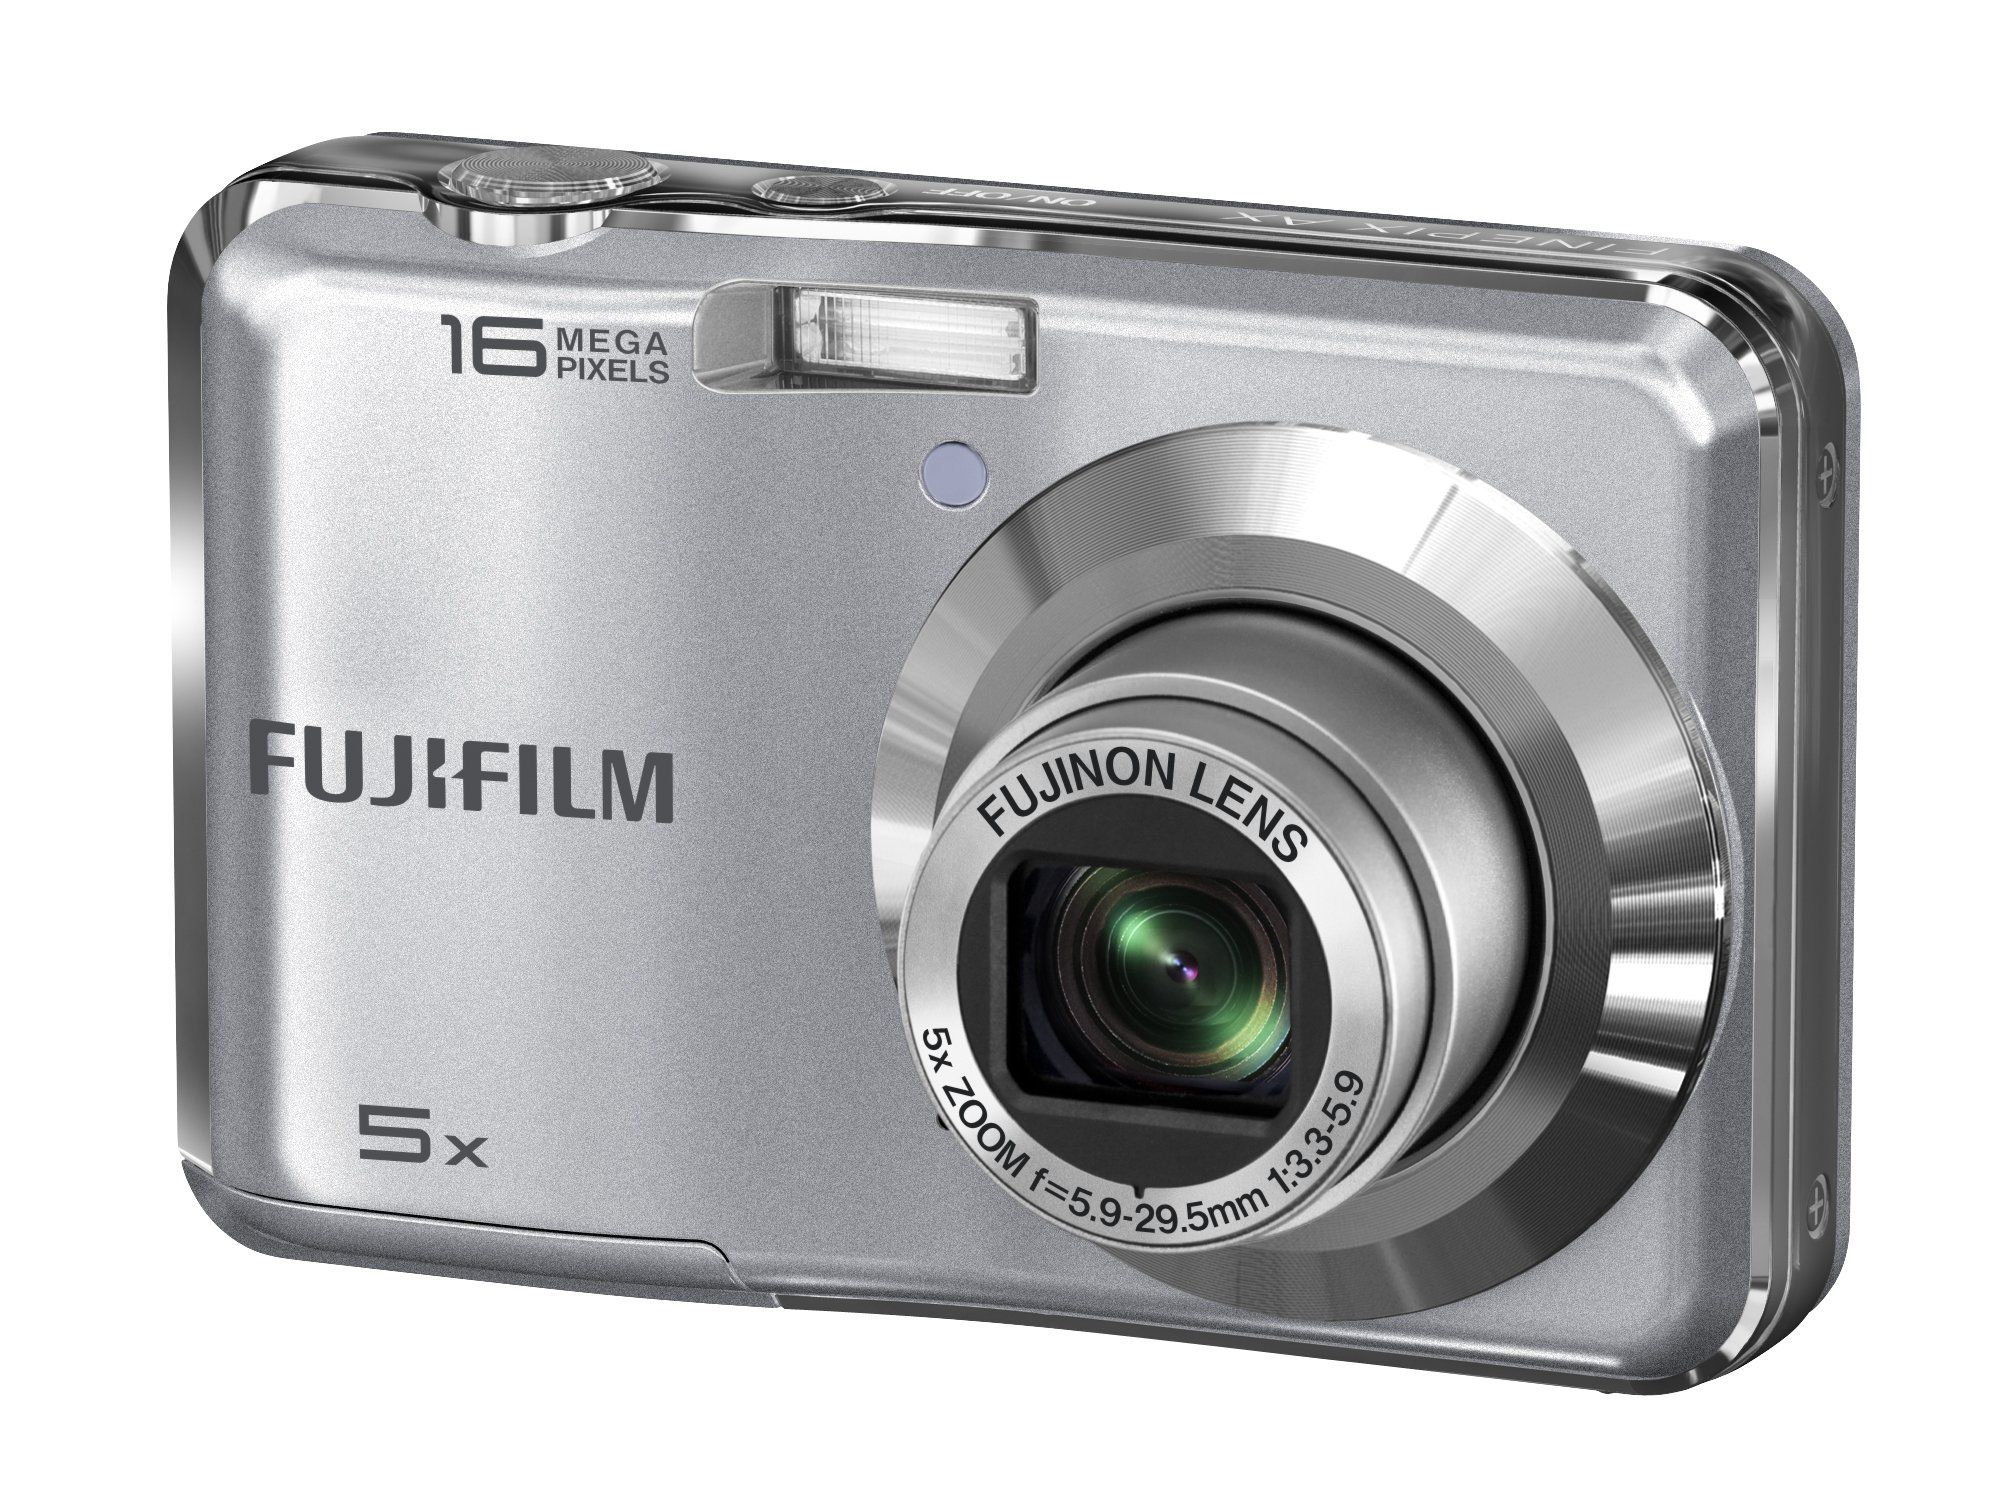 Fujifilm FinePix AX350 Silver Digital Camera. Fujifilm FinePix AX350 Silver Digital Camera.